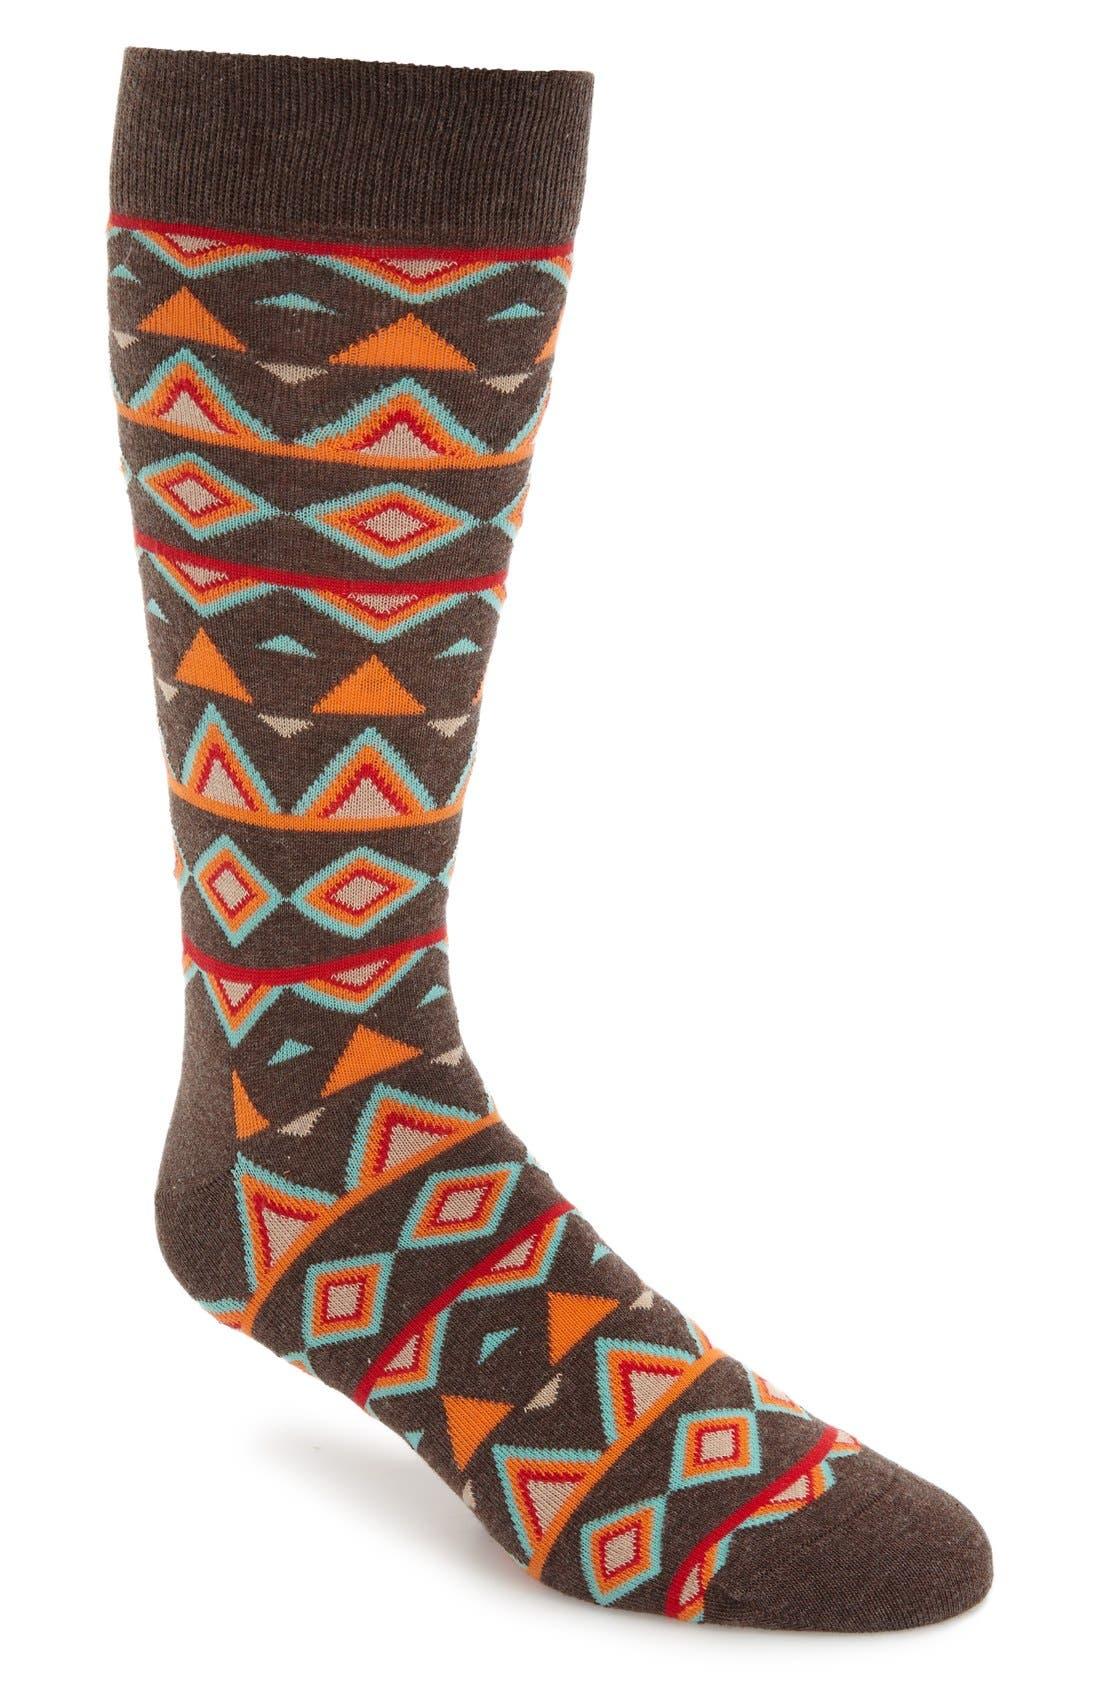 Temple Cotton Blend Socks,                         Main,                         color, Black/ Orange